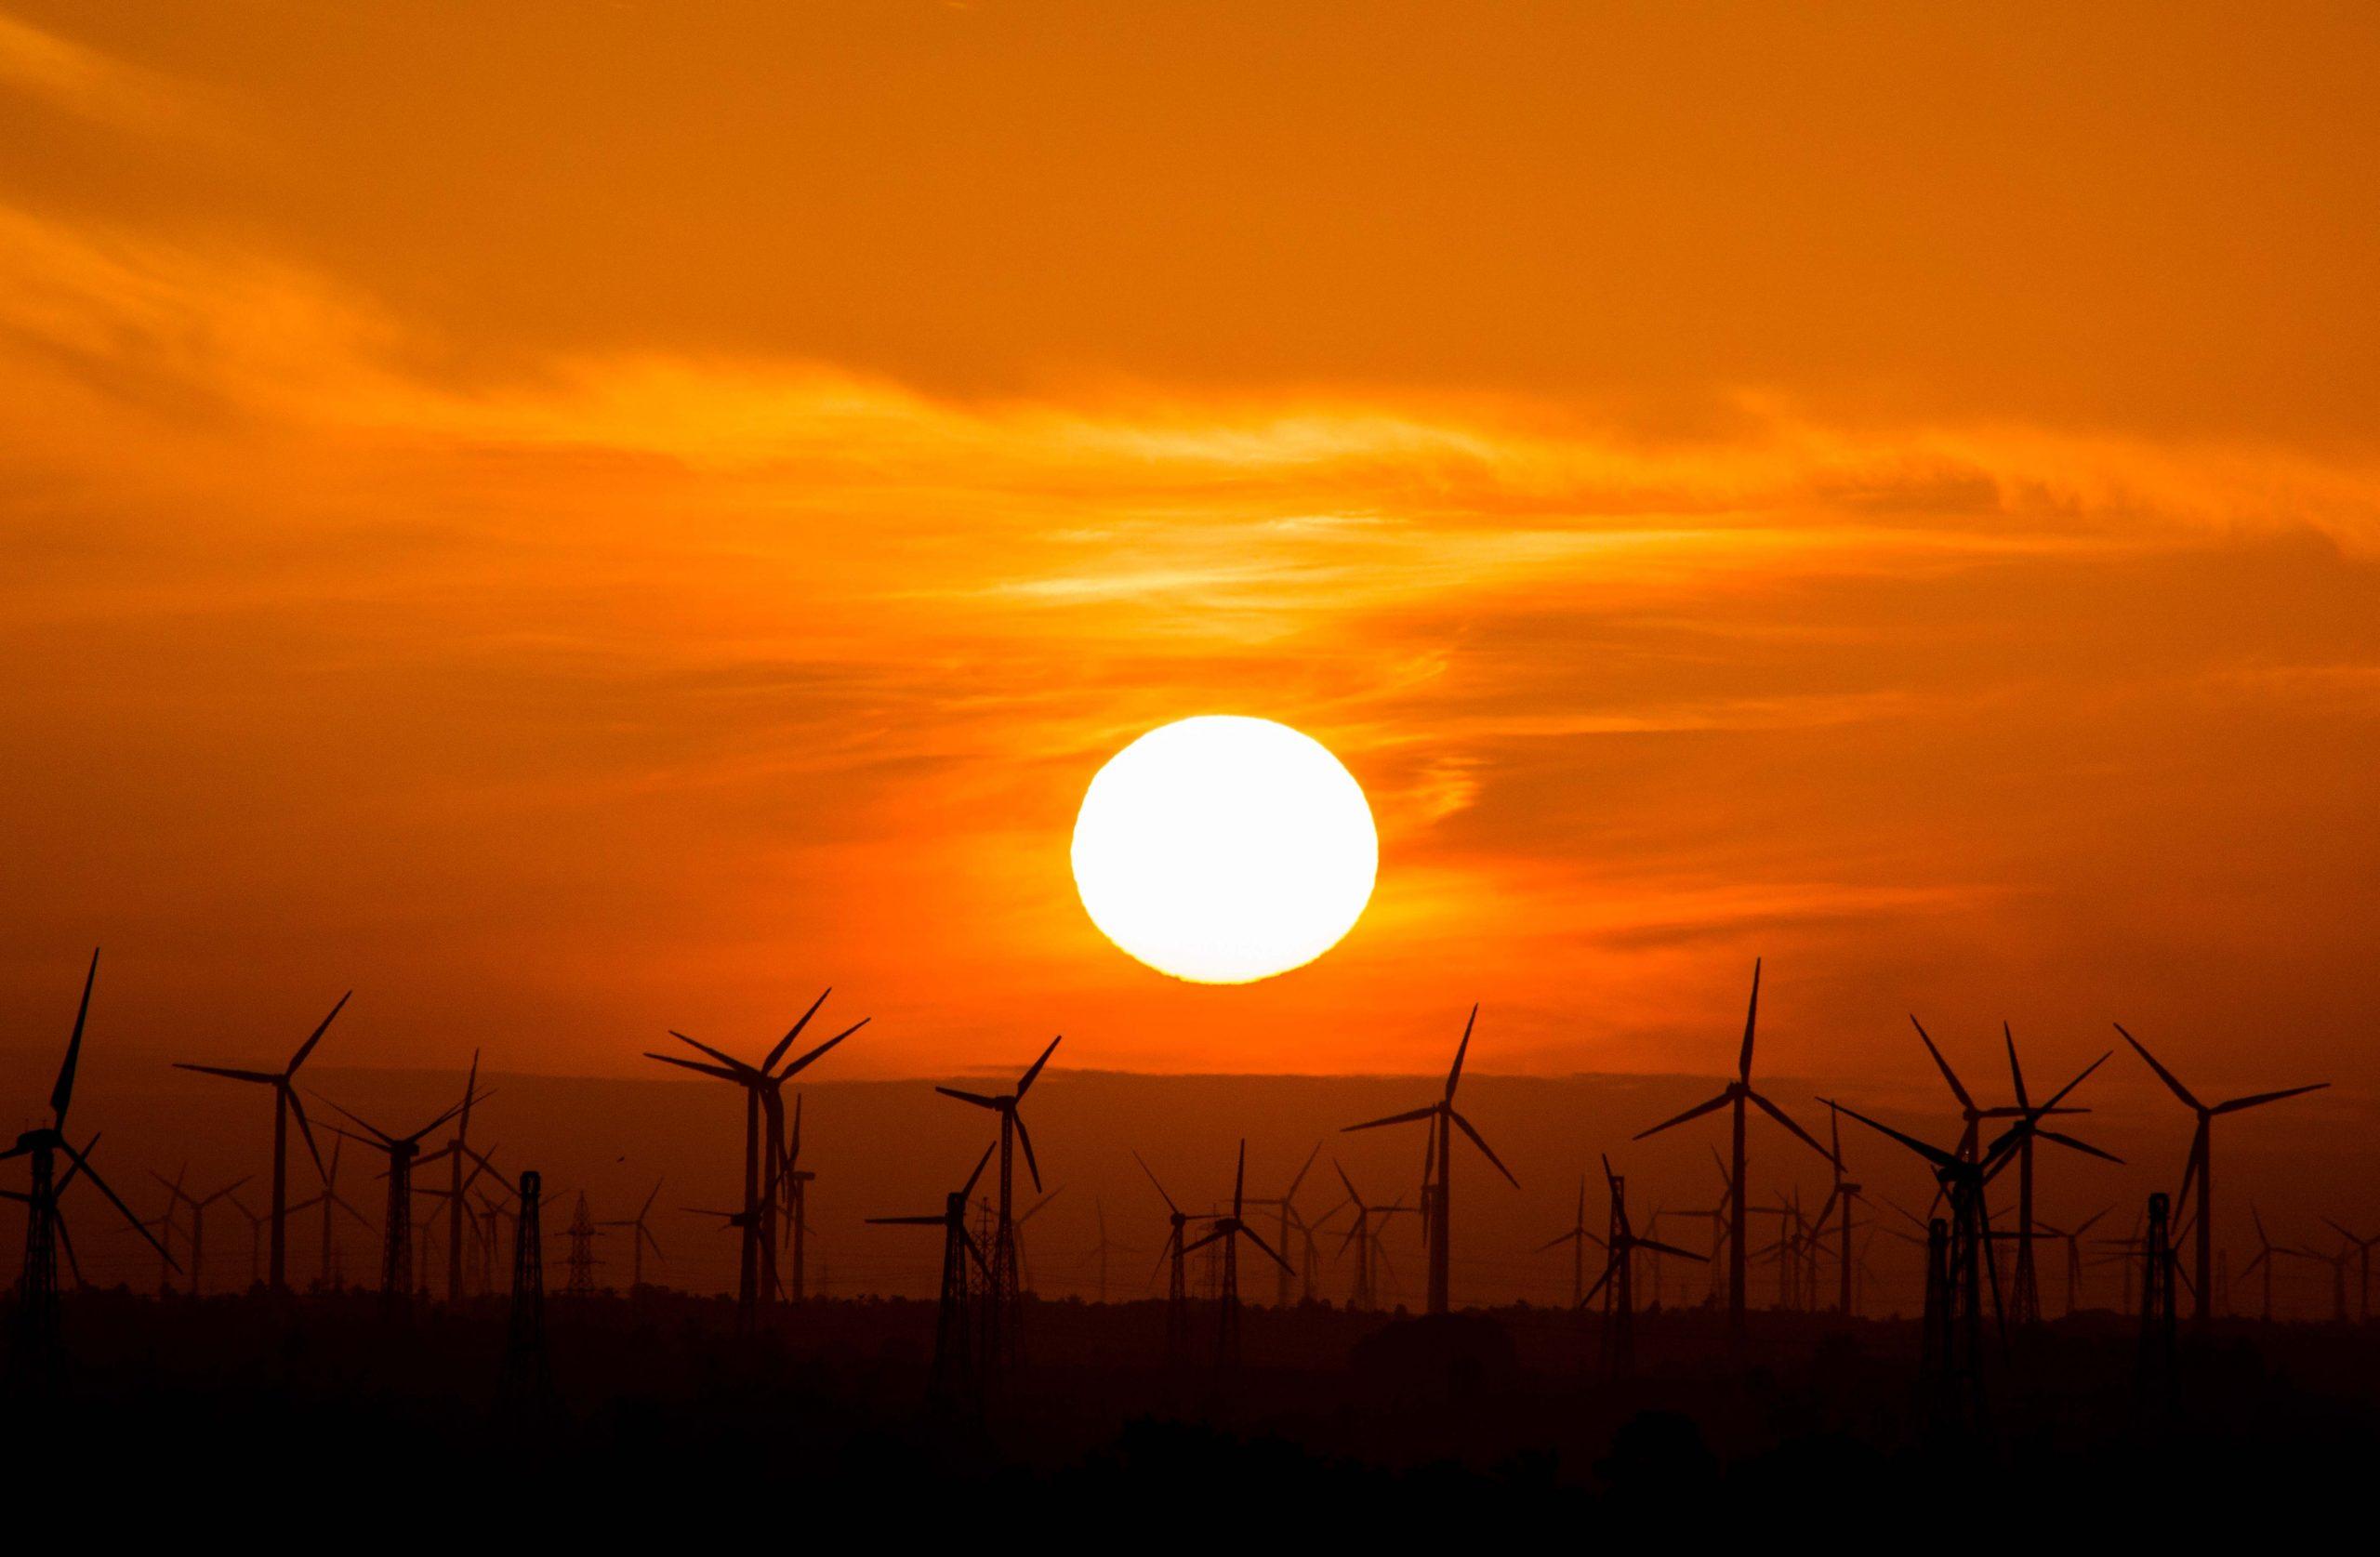 European Joint Programme for Long term Europe-Africa Partnership on Renewable Energy